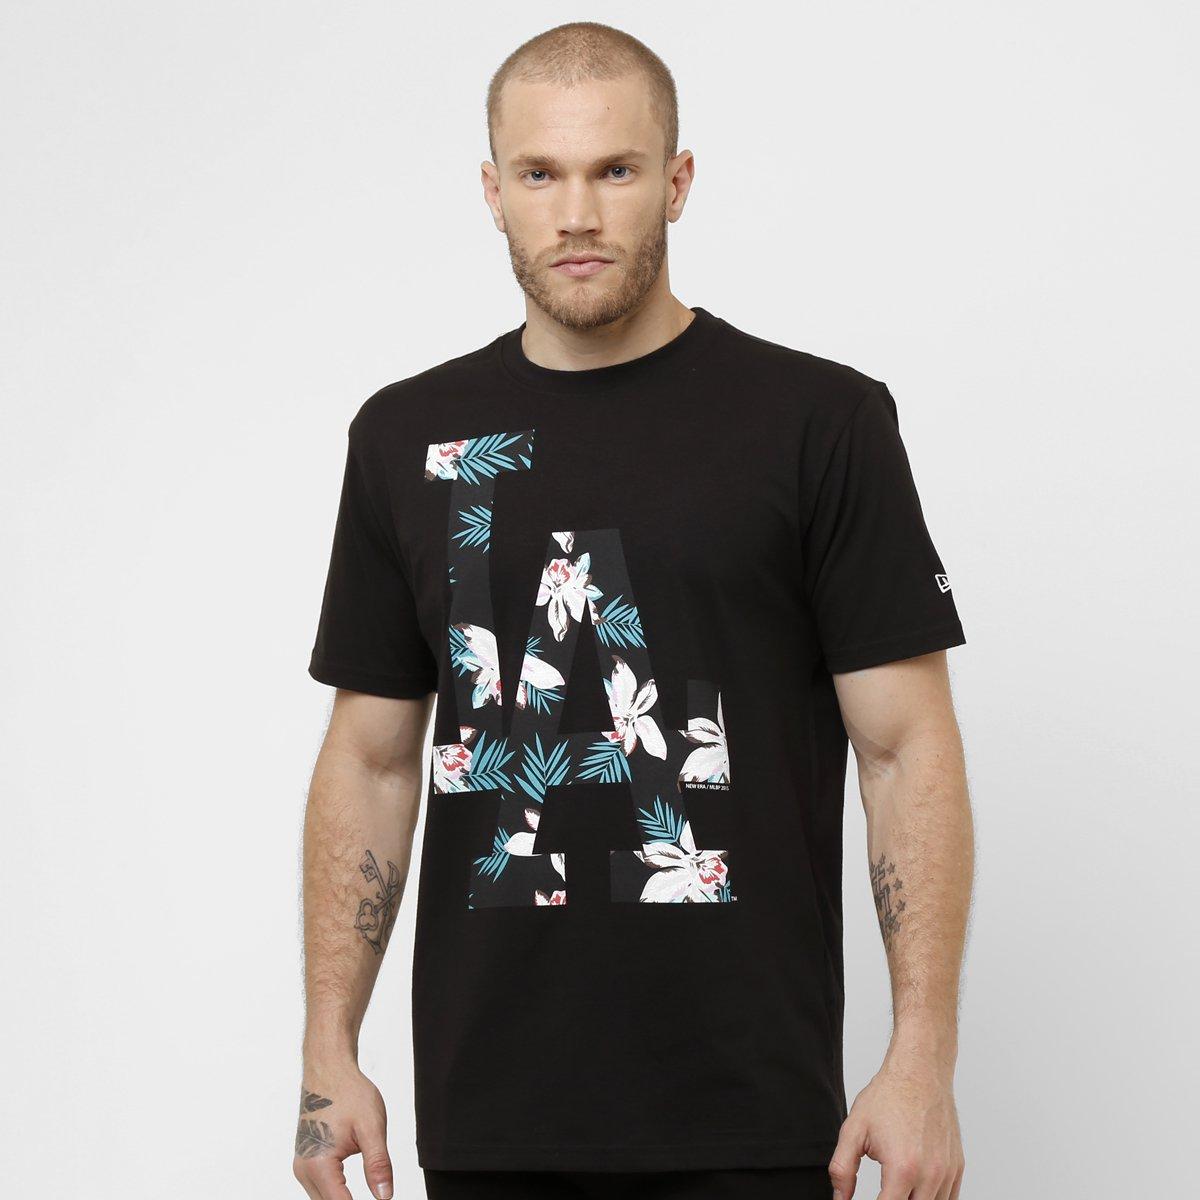 c654b35682dfa Camiseta New Era MLB Floral Los Angeles Dodgers - Compre Agora ...